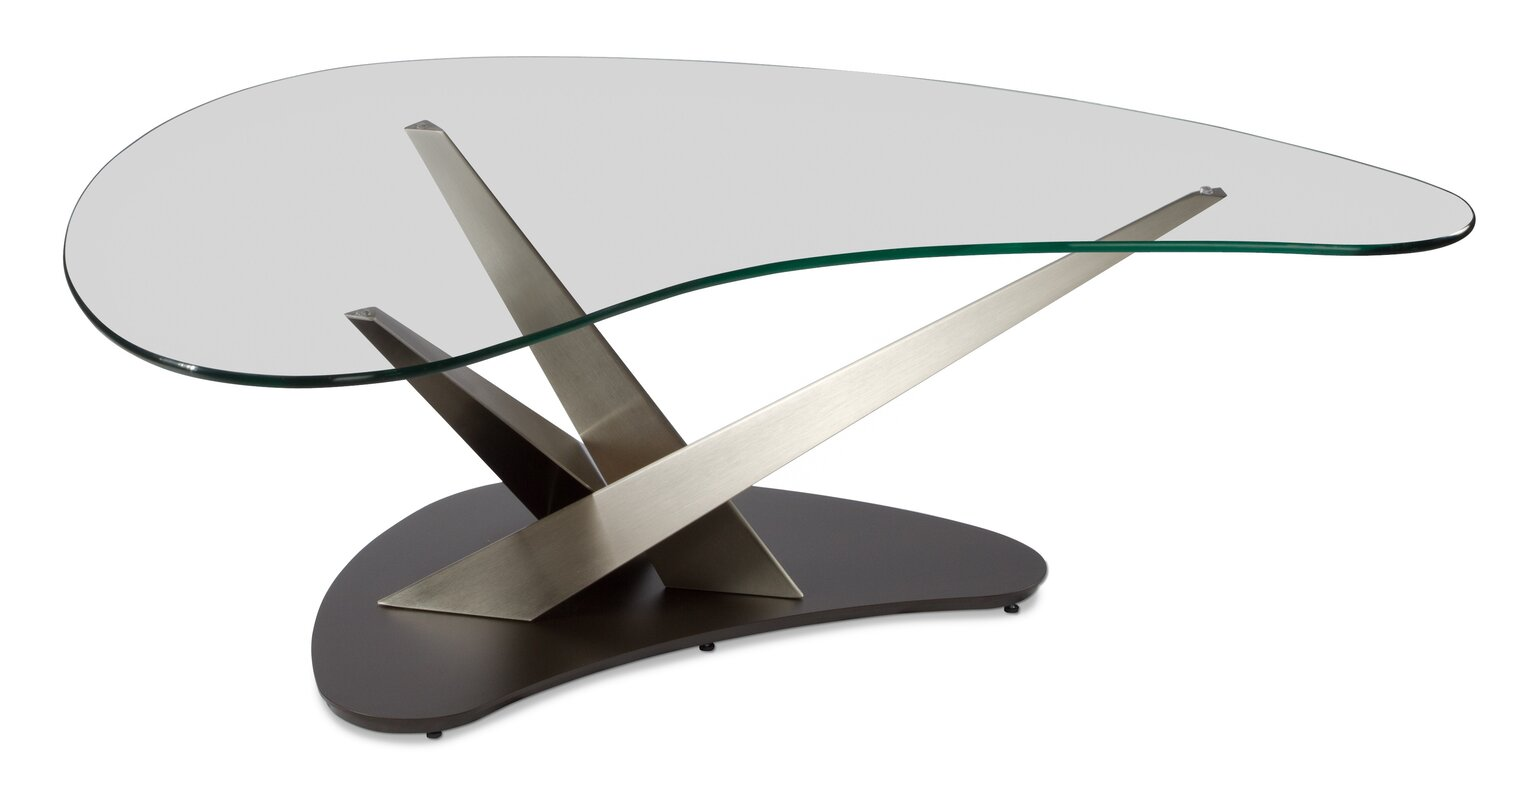 Elitemodern crystal boomerang coffee table reviews wayfair crystal boomerang coffee table geotapseo Choice Image